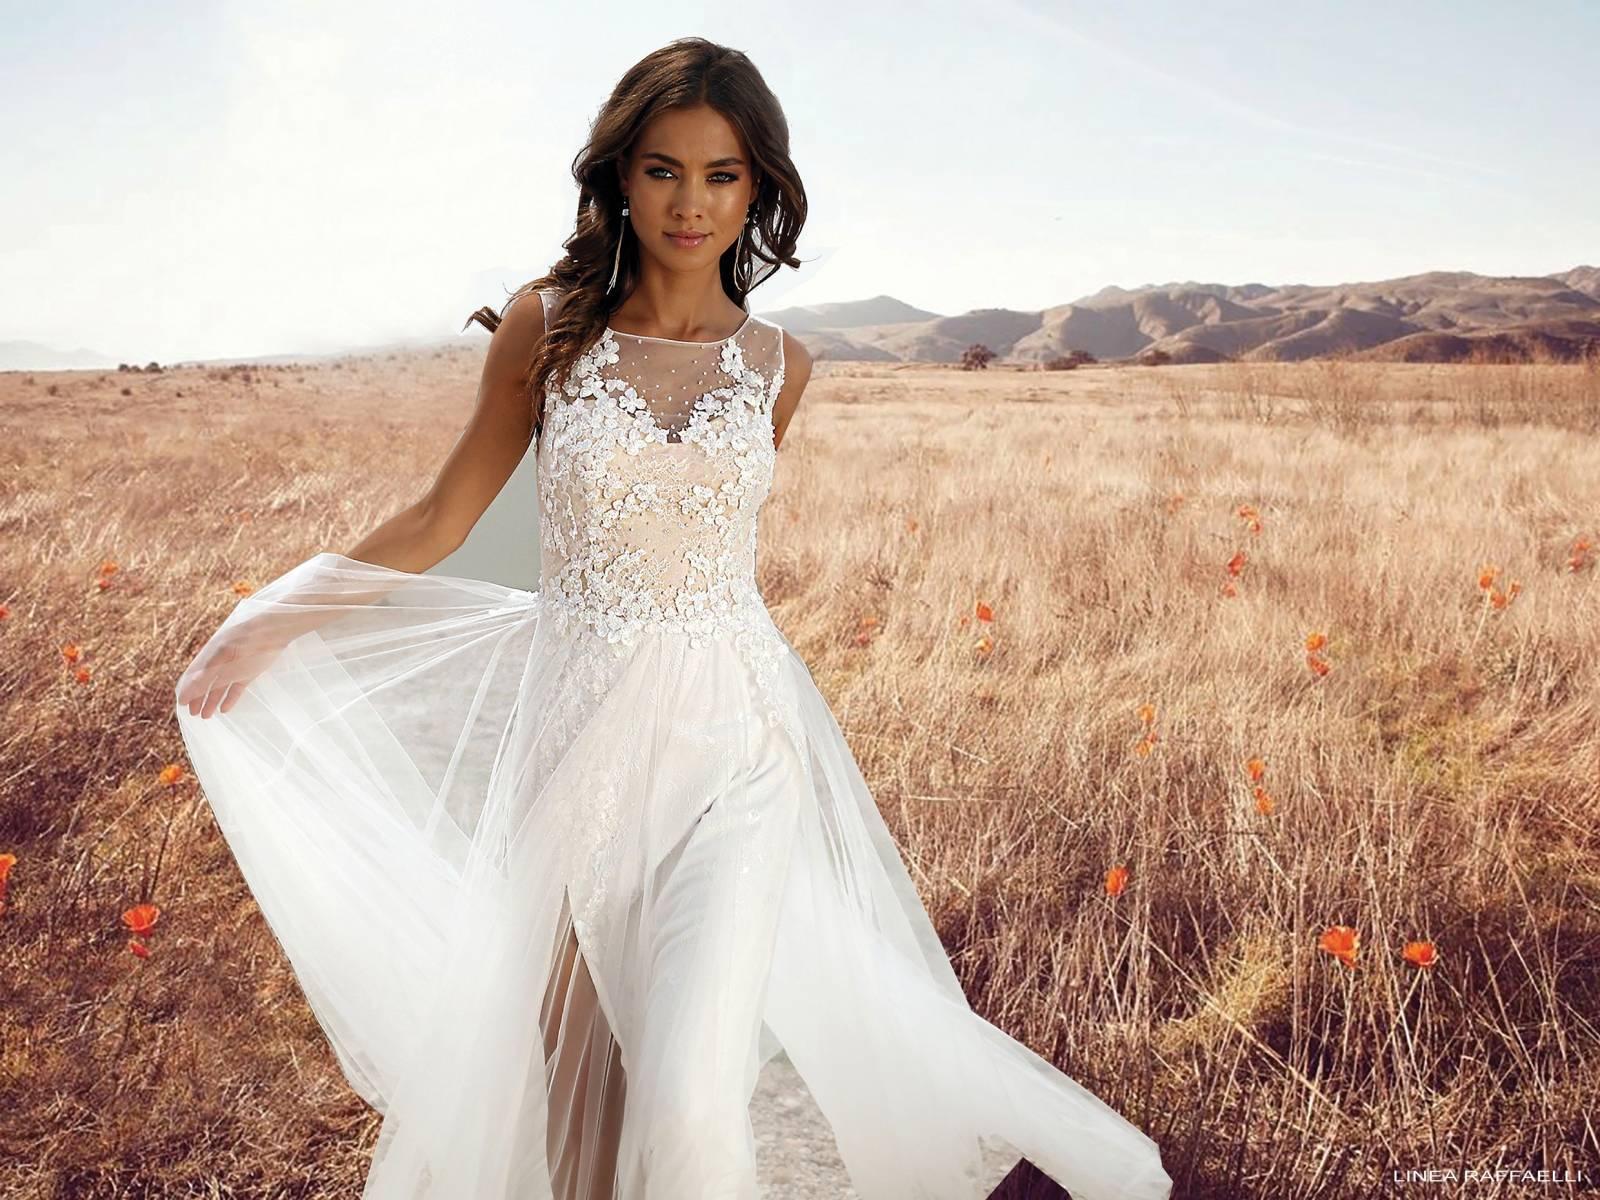 Cermo Concept - Bruidsmode winkel - Trouwjurk - Kostuum - House of Weddings - 2